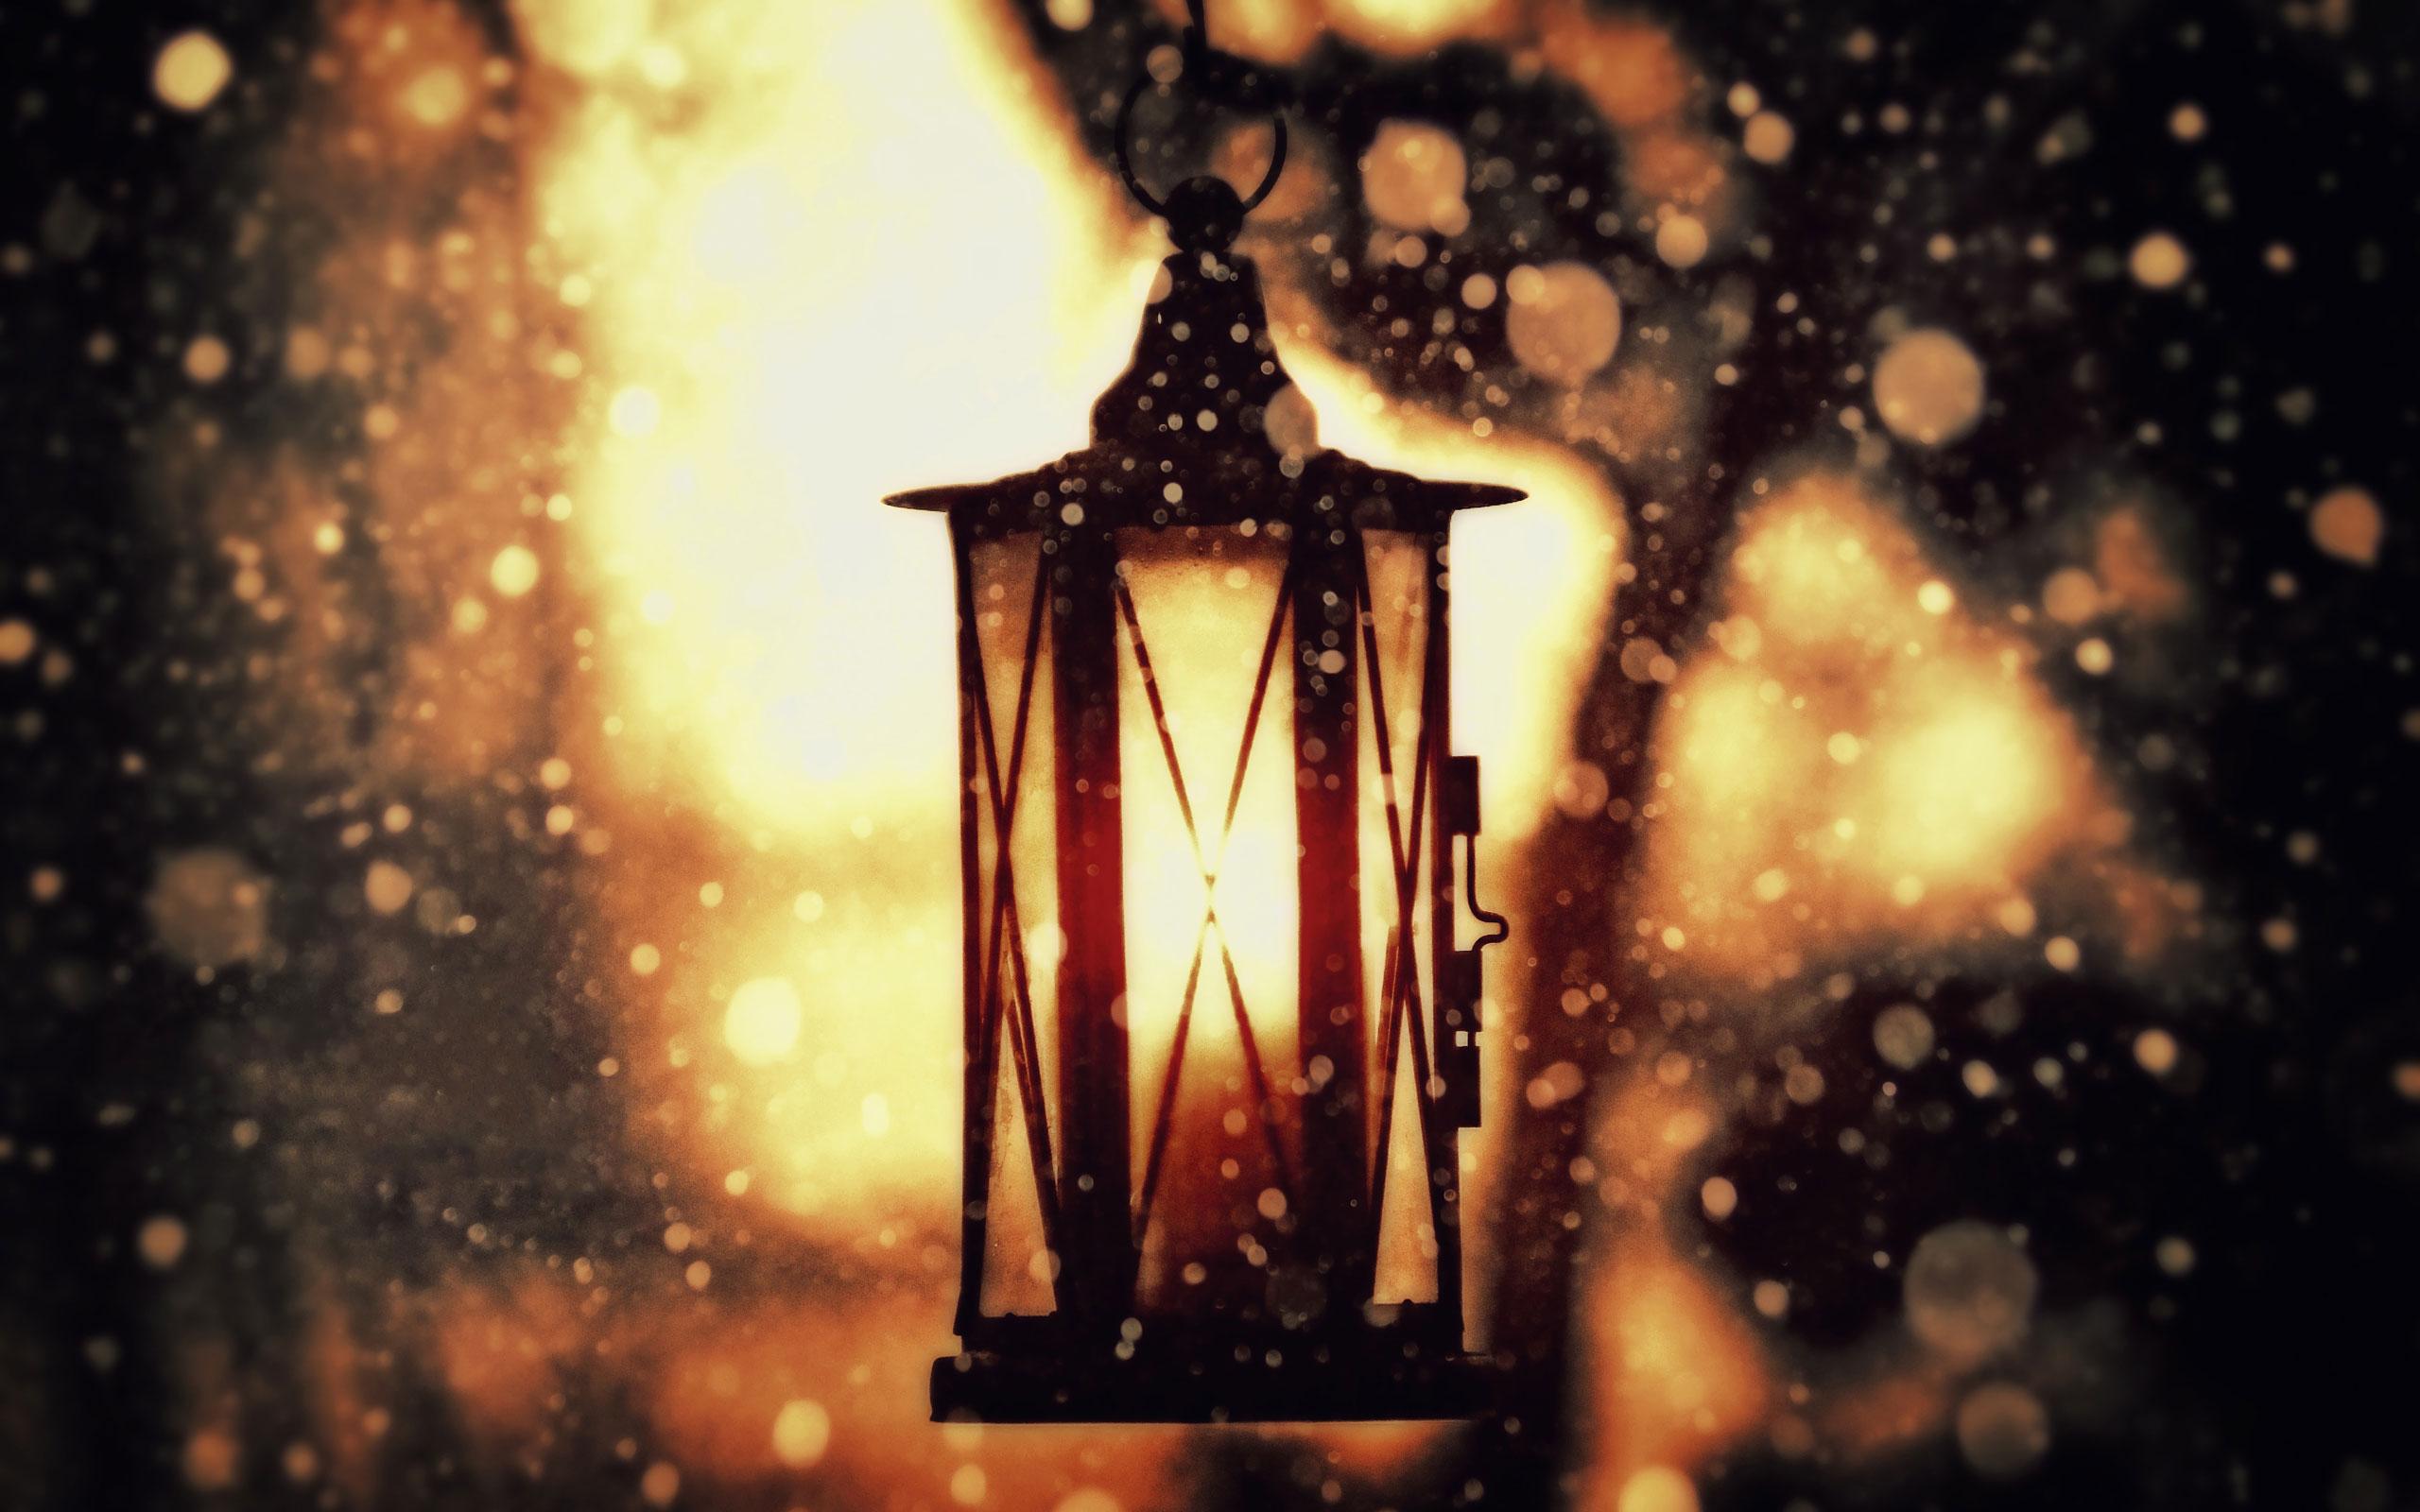 Artistic wallpaper Sunlight and lantern